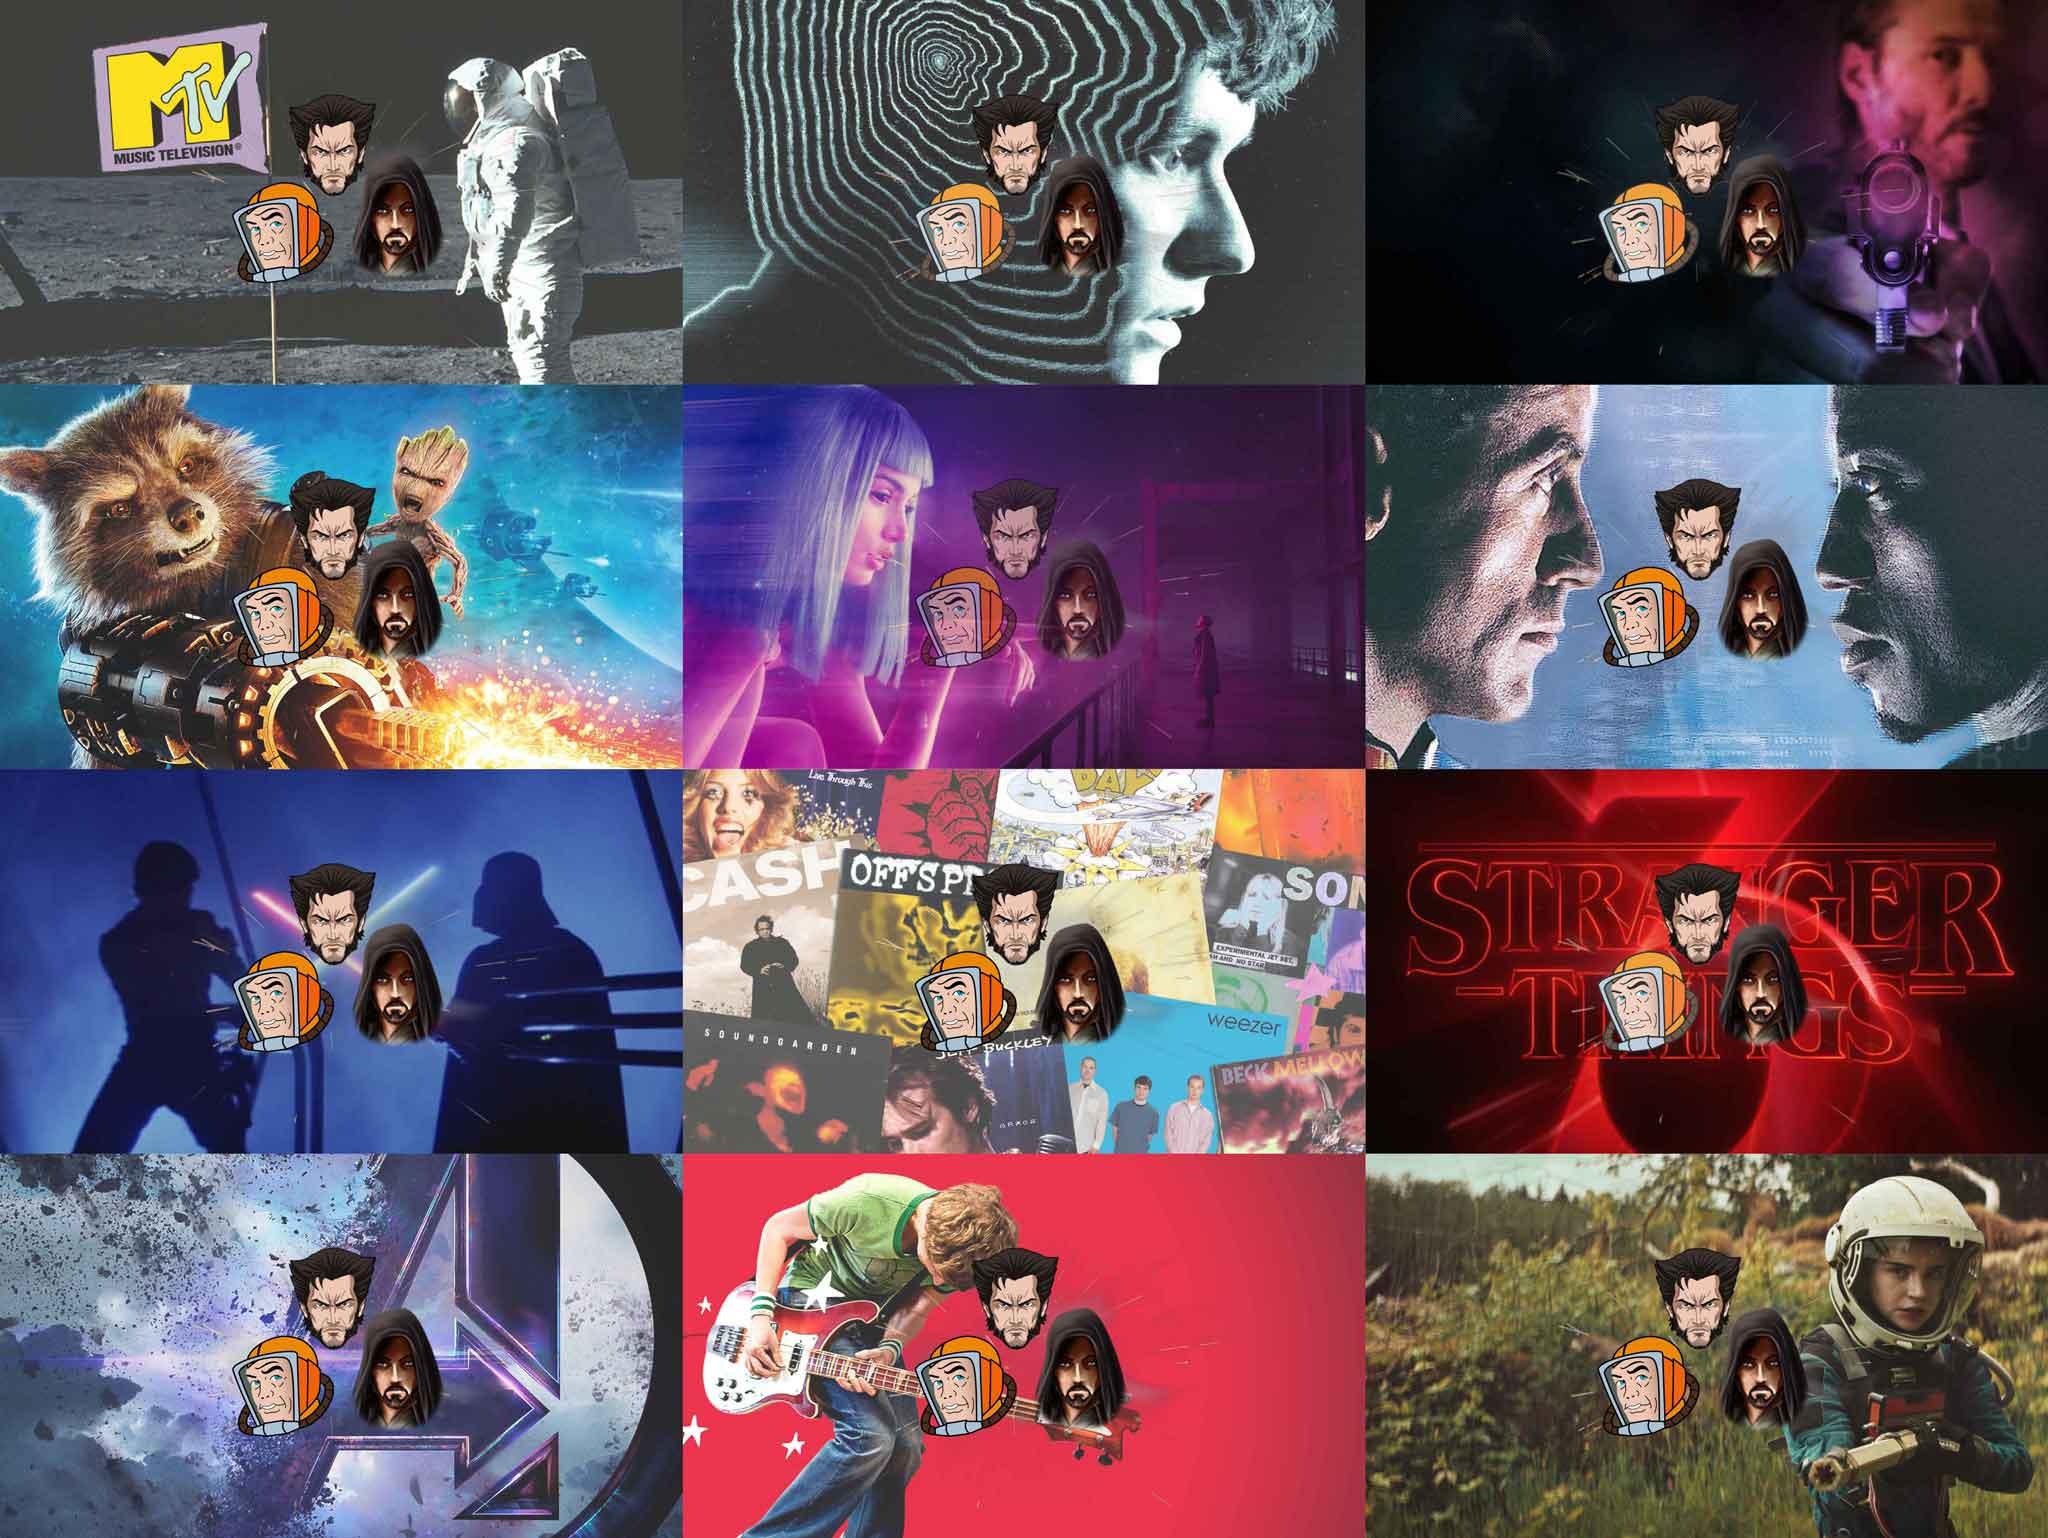 ep-image-collage-2sm.jpg